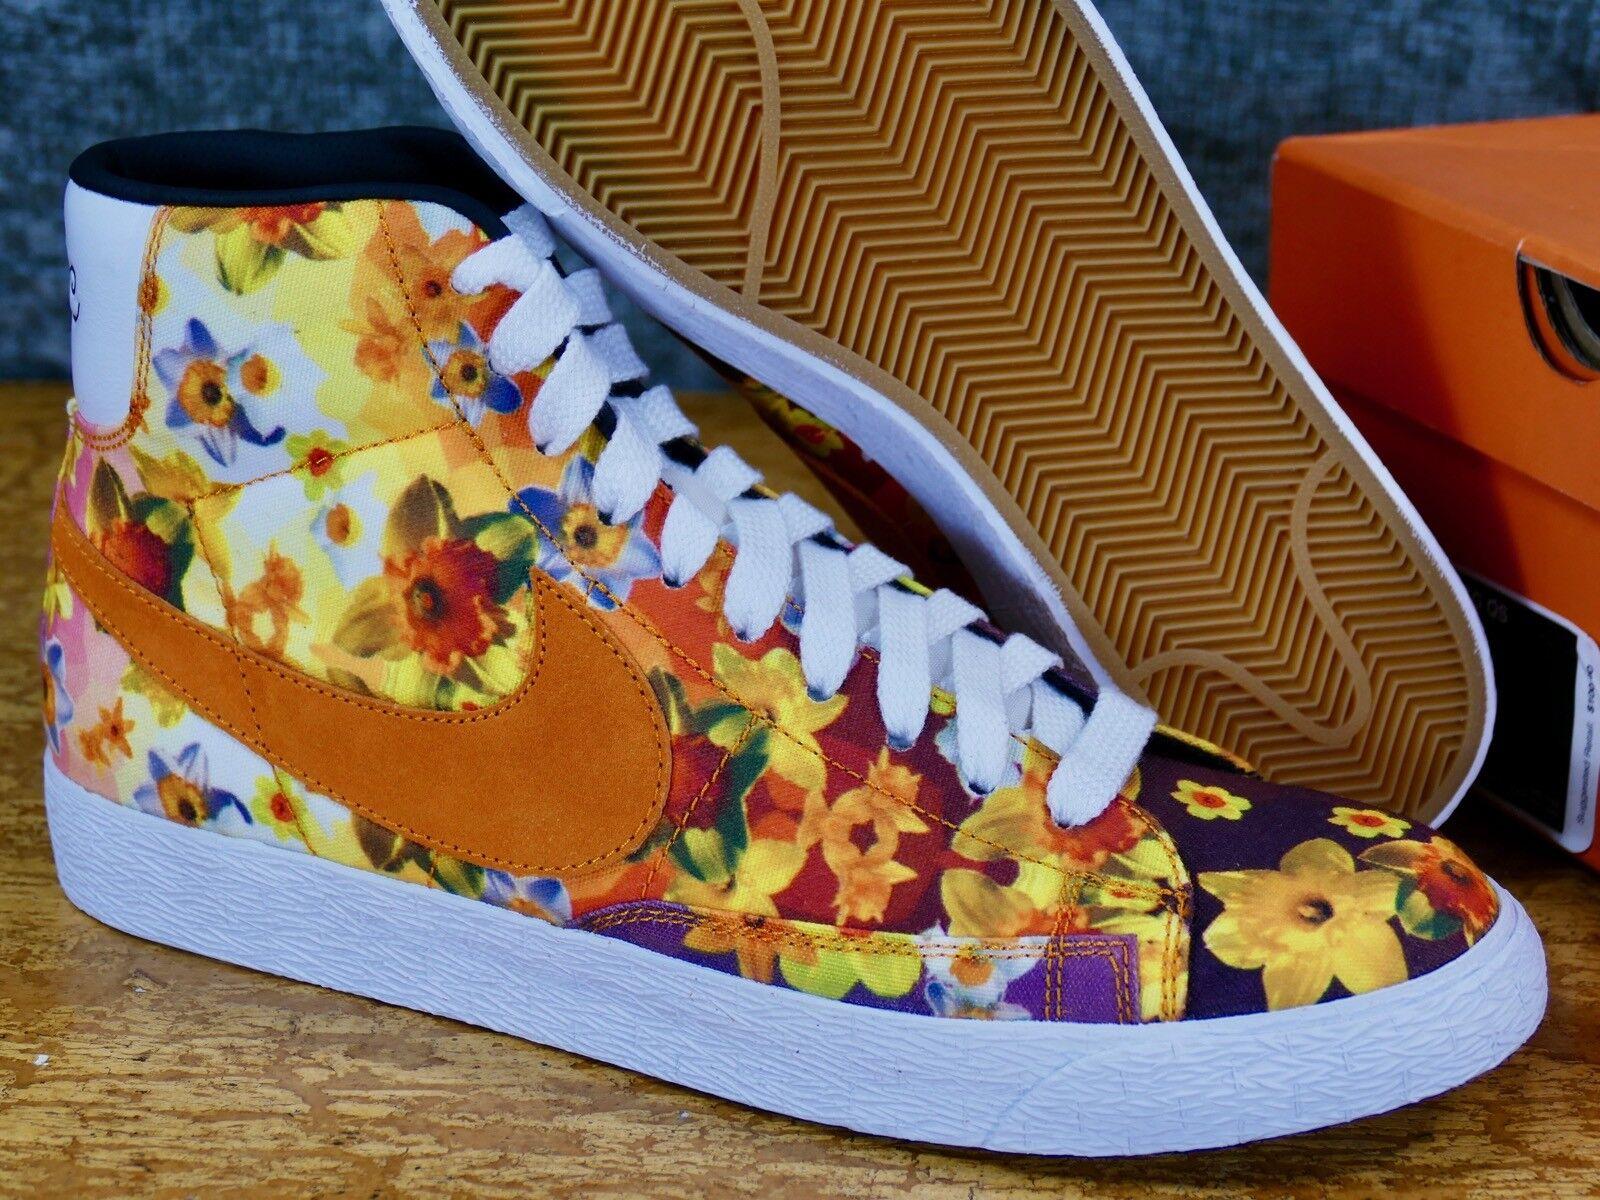 Nike Blazer Mid PRM VNTG QS - Floral pack NYC New York City 2018 kumquat black